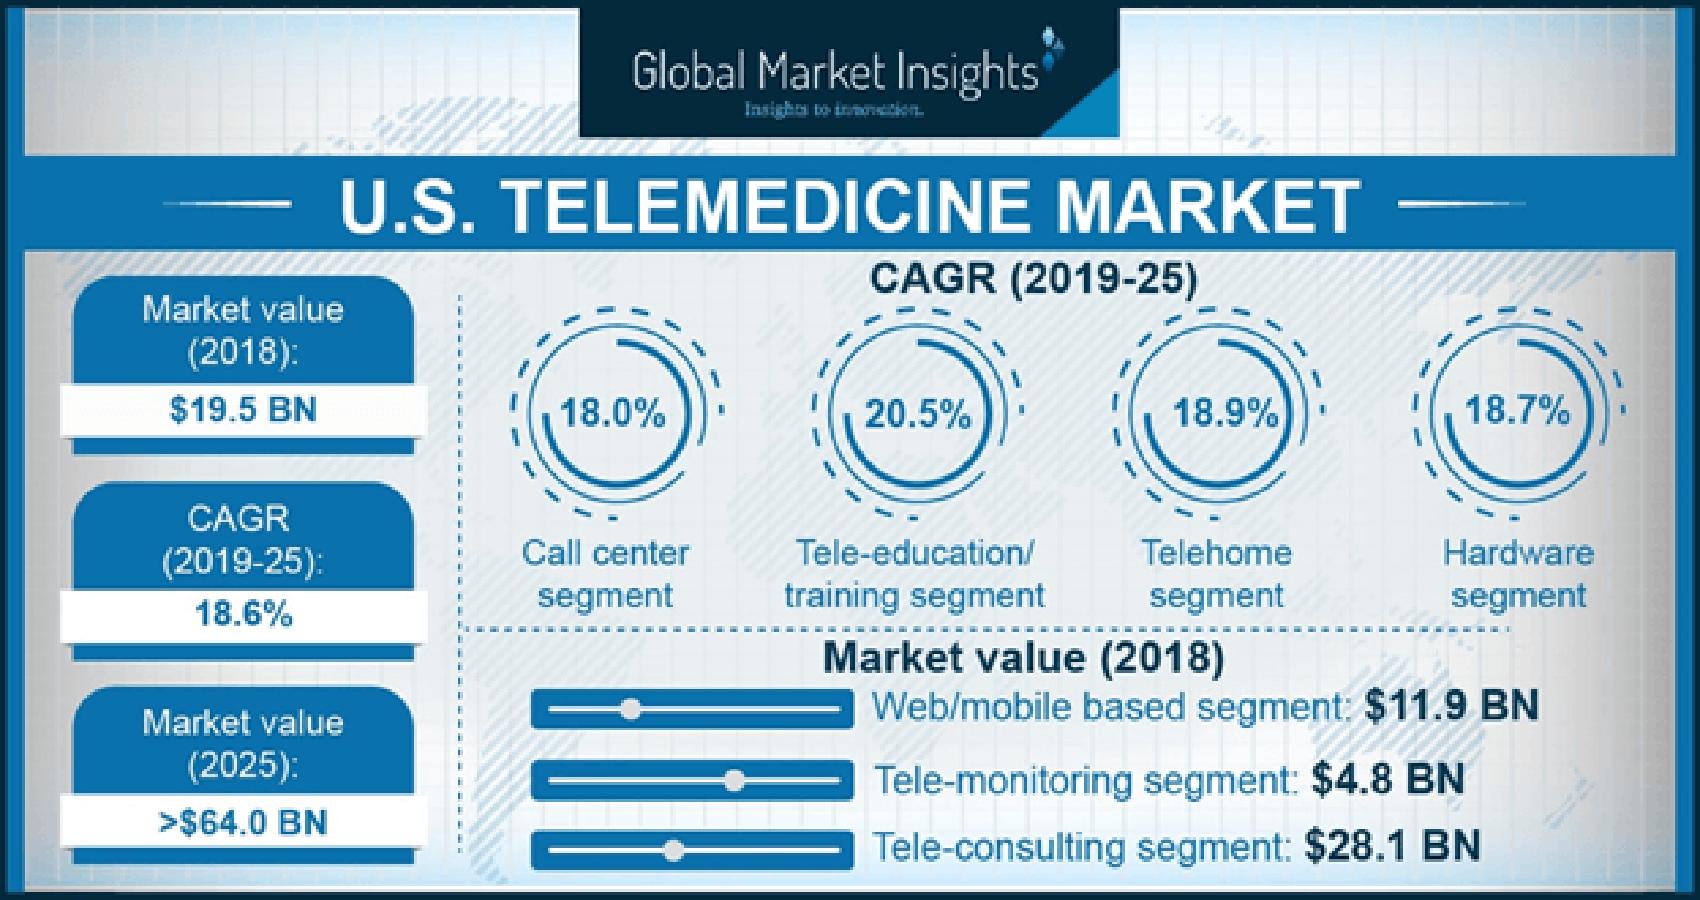 Telemedicine Market to Reach US$ 202.8 Billion by 2027 Globally